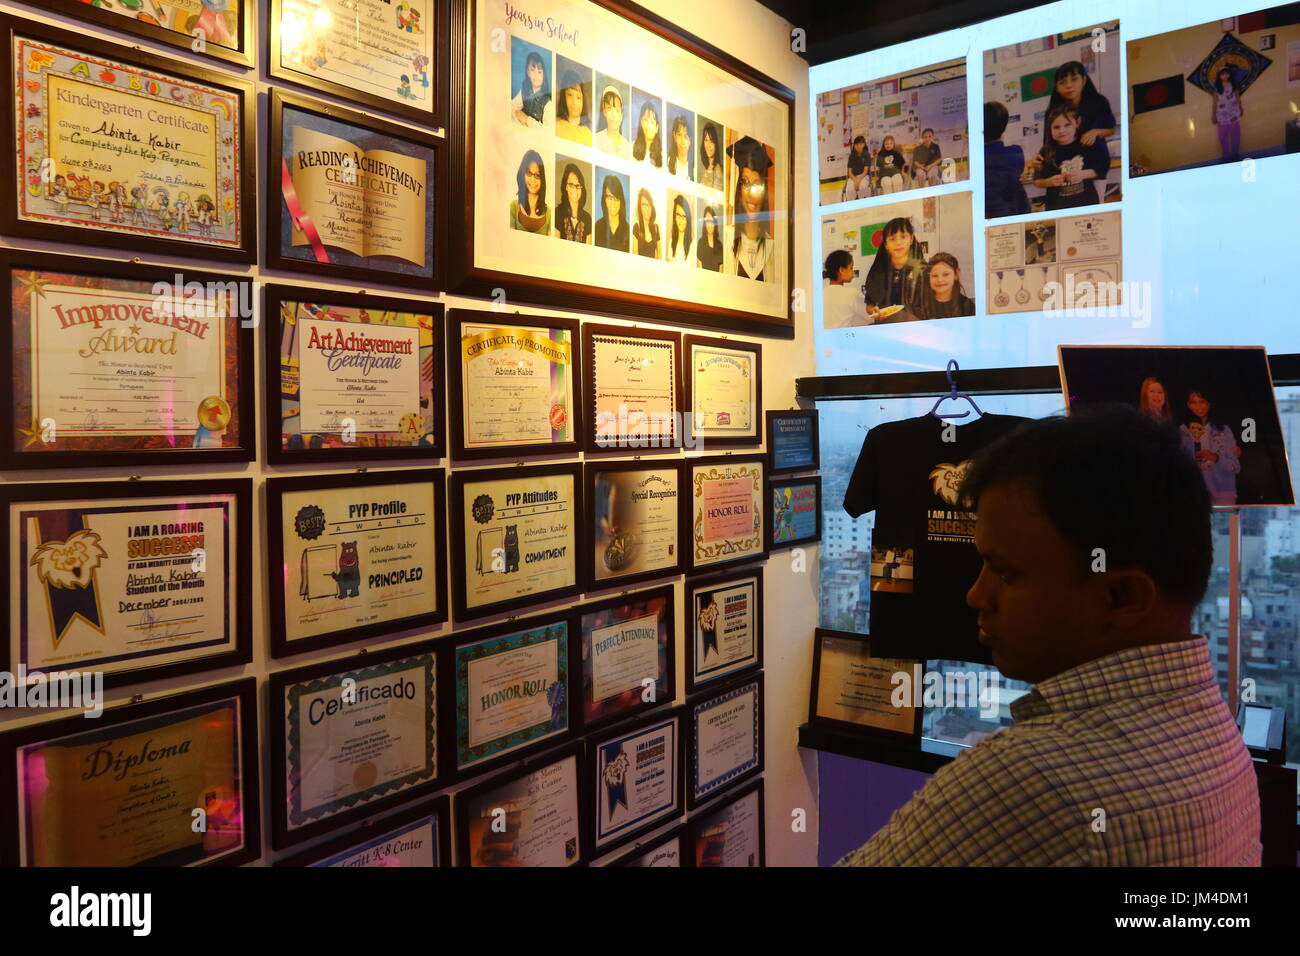 office space memorabilia. visitors look at the memorabilia of abinta kabir on display in a corner office space foundation. was killed during terro m